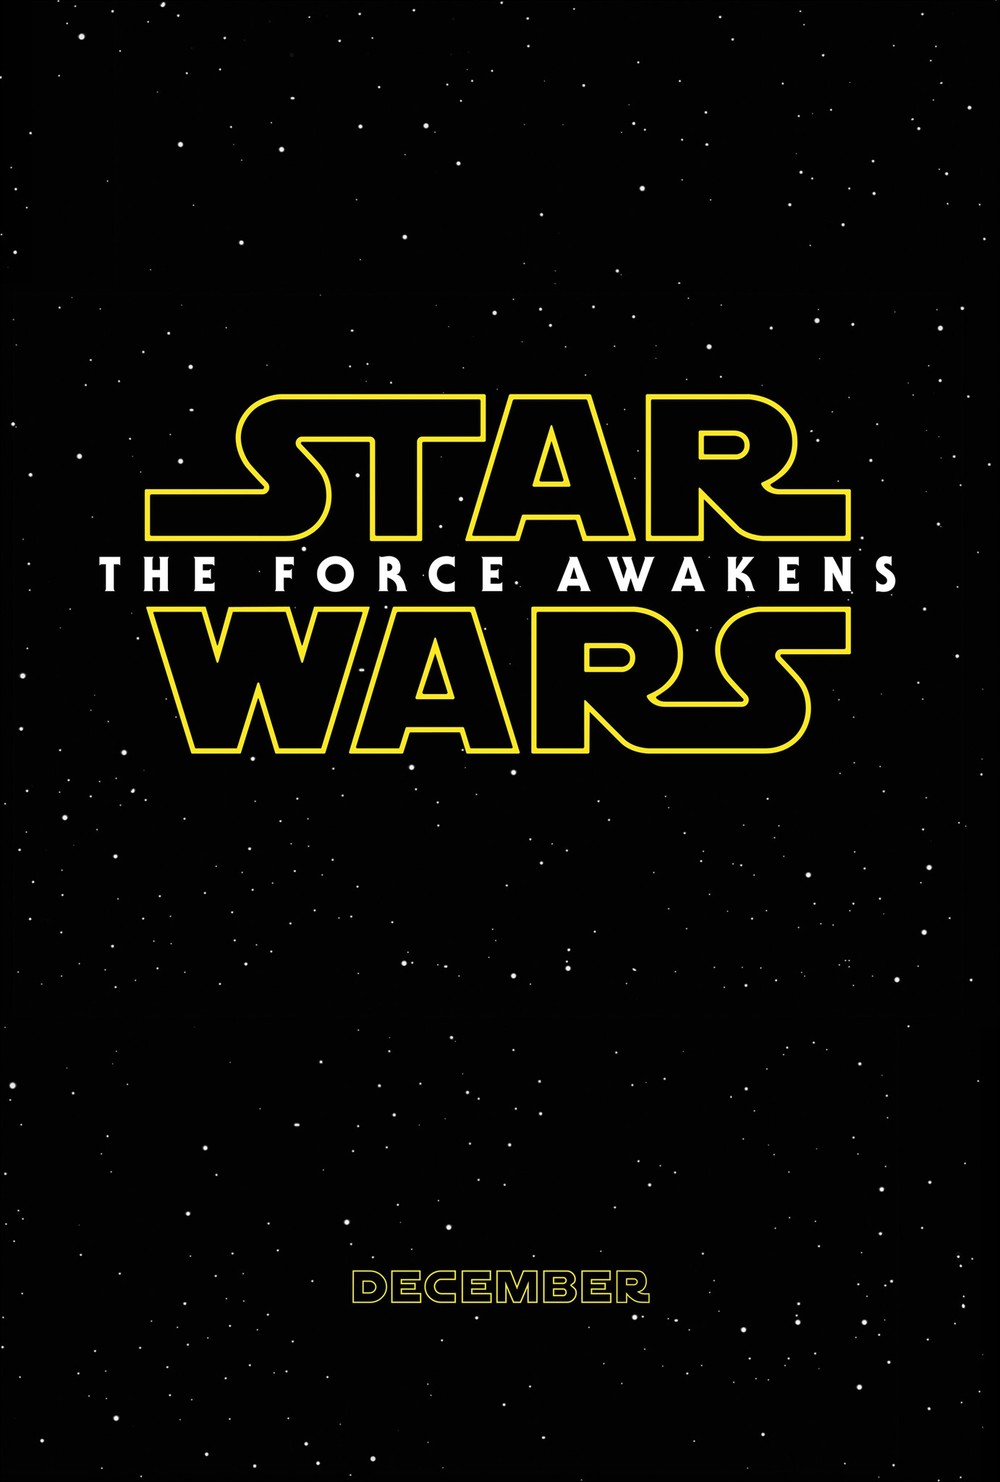 Star wars 7 date in Sydney